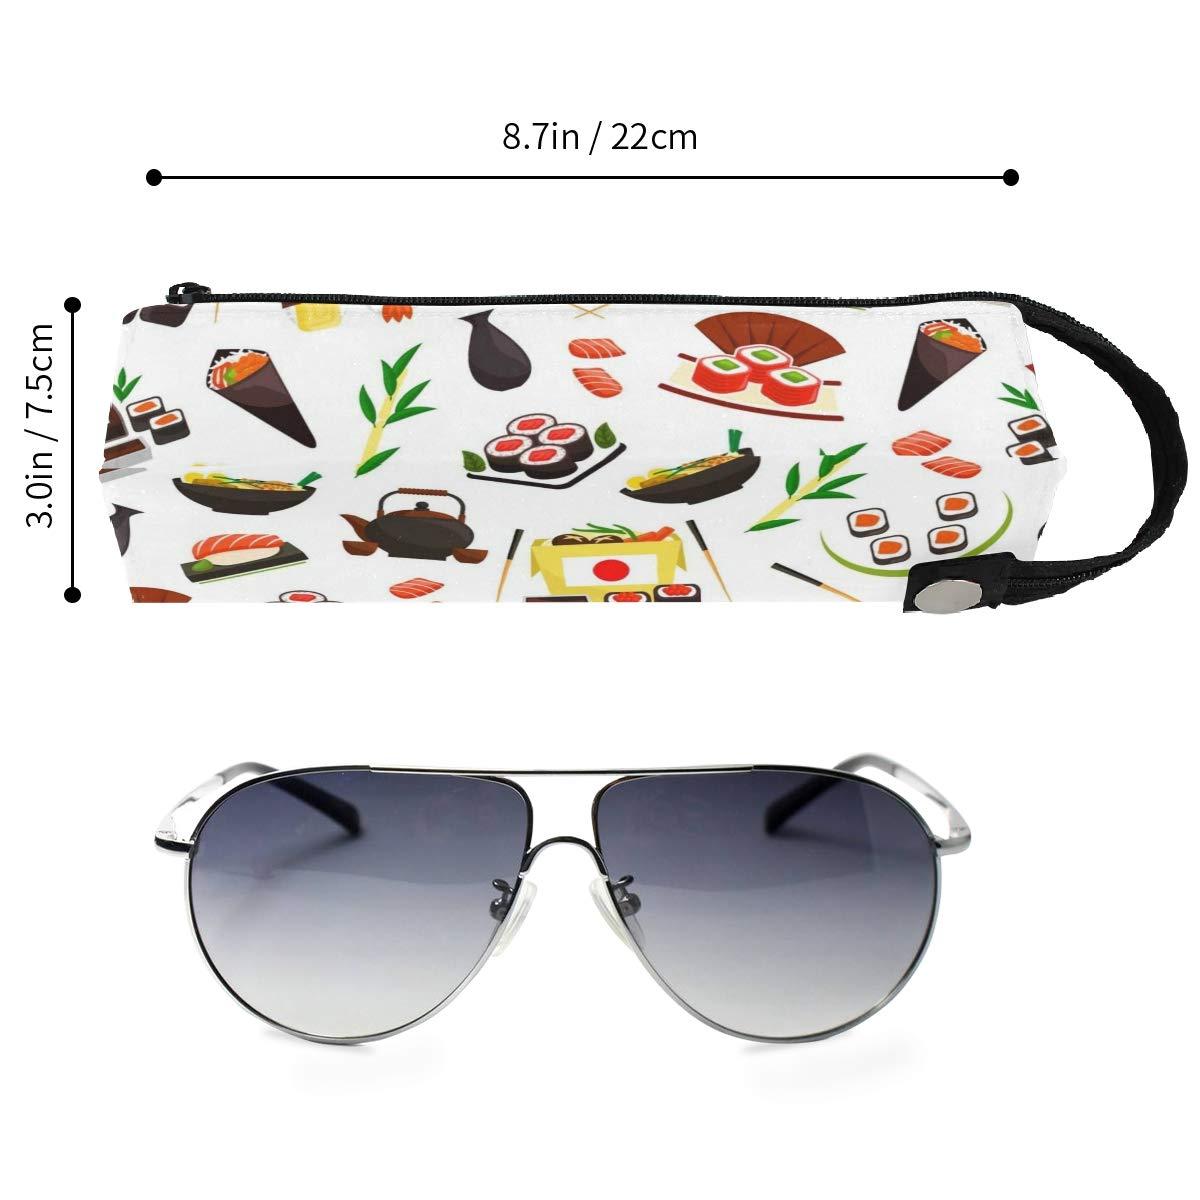 My Little Nest Eyeglass Sunglasses Holder Pouch Bag Cartoon Japanese Sushi Multi Function Zipper Pen Case Pencil Bag Organizer